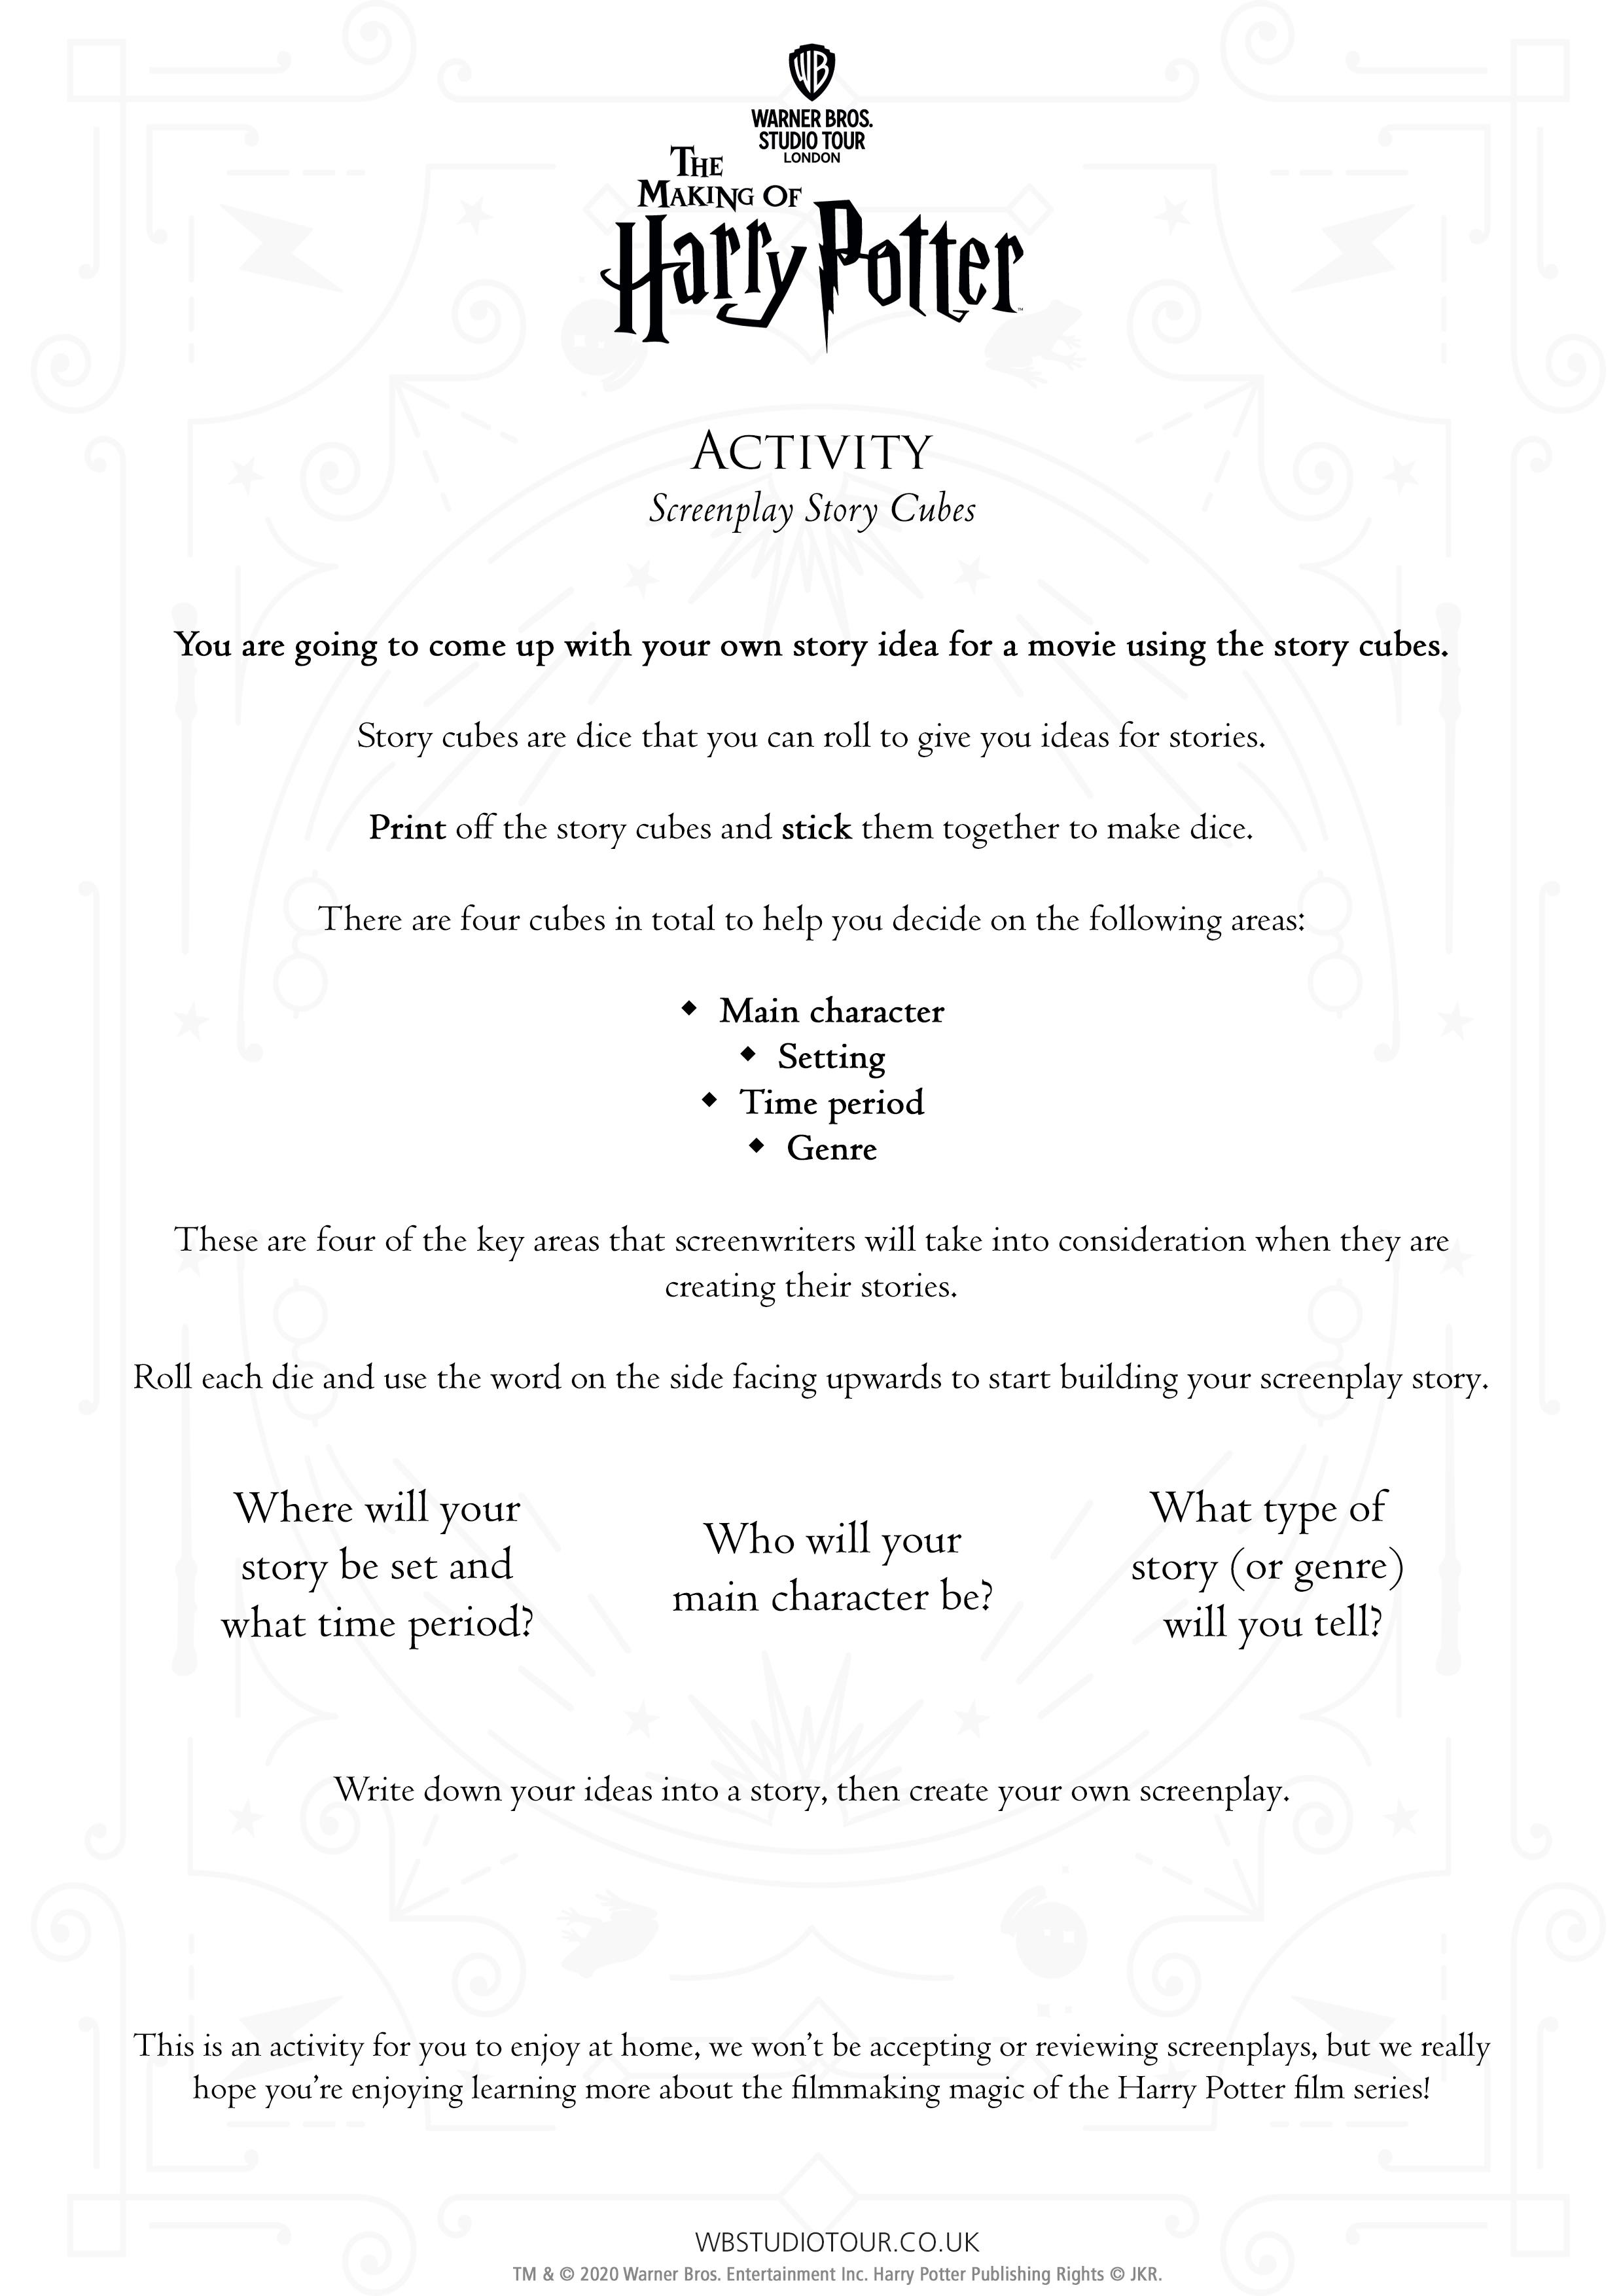 Screenplay activity sheet page 2